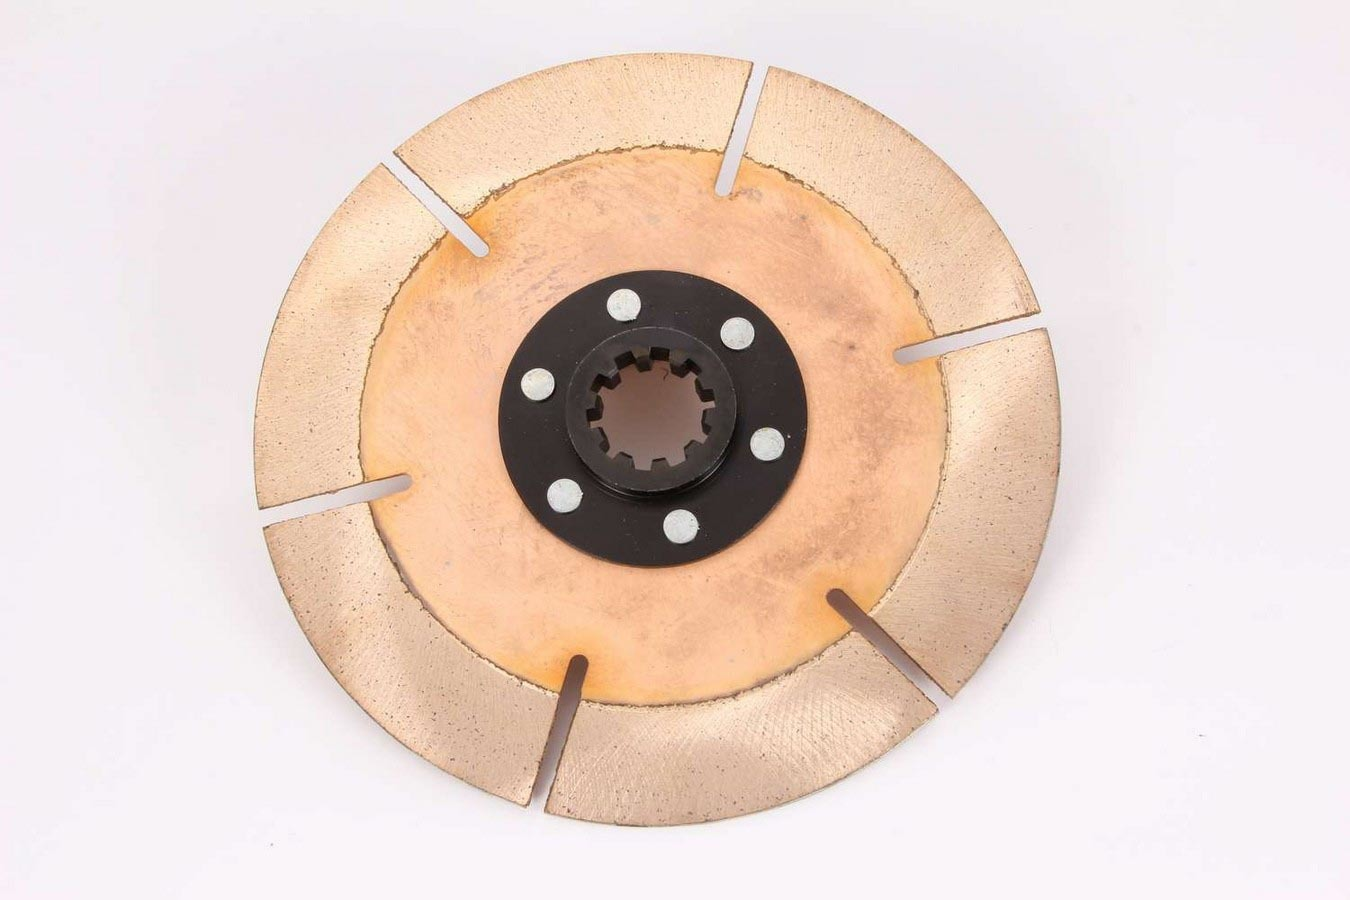 ACE Racing Clutches R725103K Clutch Disc, 7-1/4 in Diameter, 1-1/8 in x 10 Spline, Ceramic / Metallic, Universal, Each